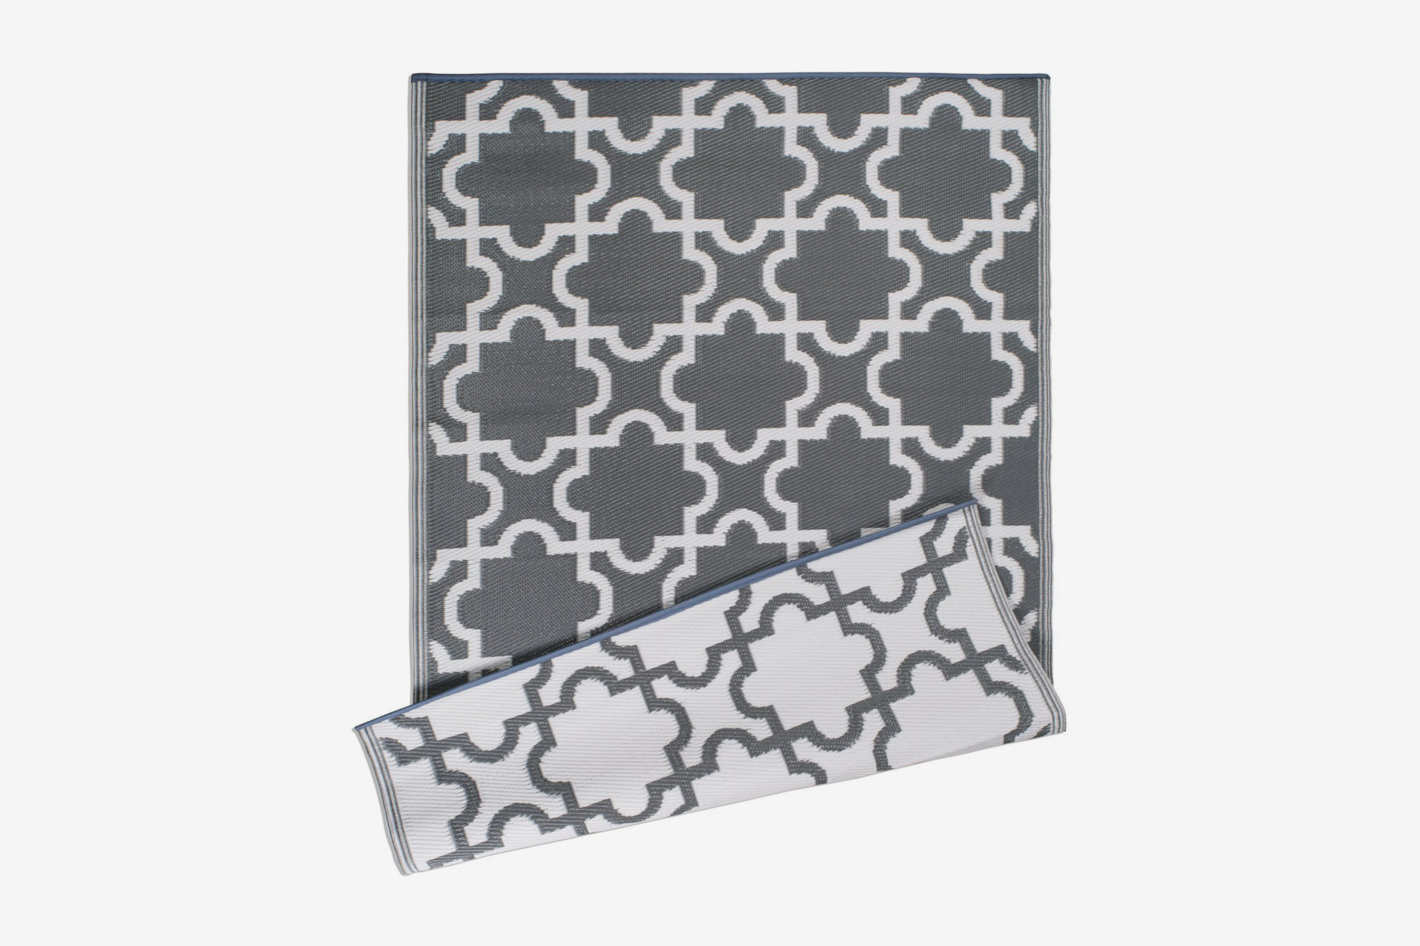 DII Moroccan Indoor-Outdoor Lightweight, Reversible, and Fade-Resistant Area Rug